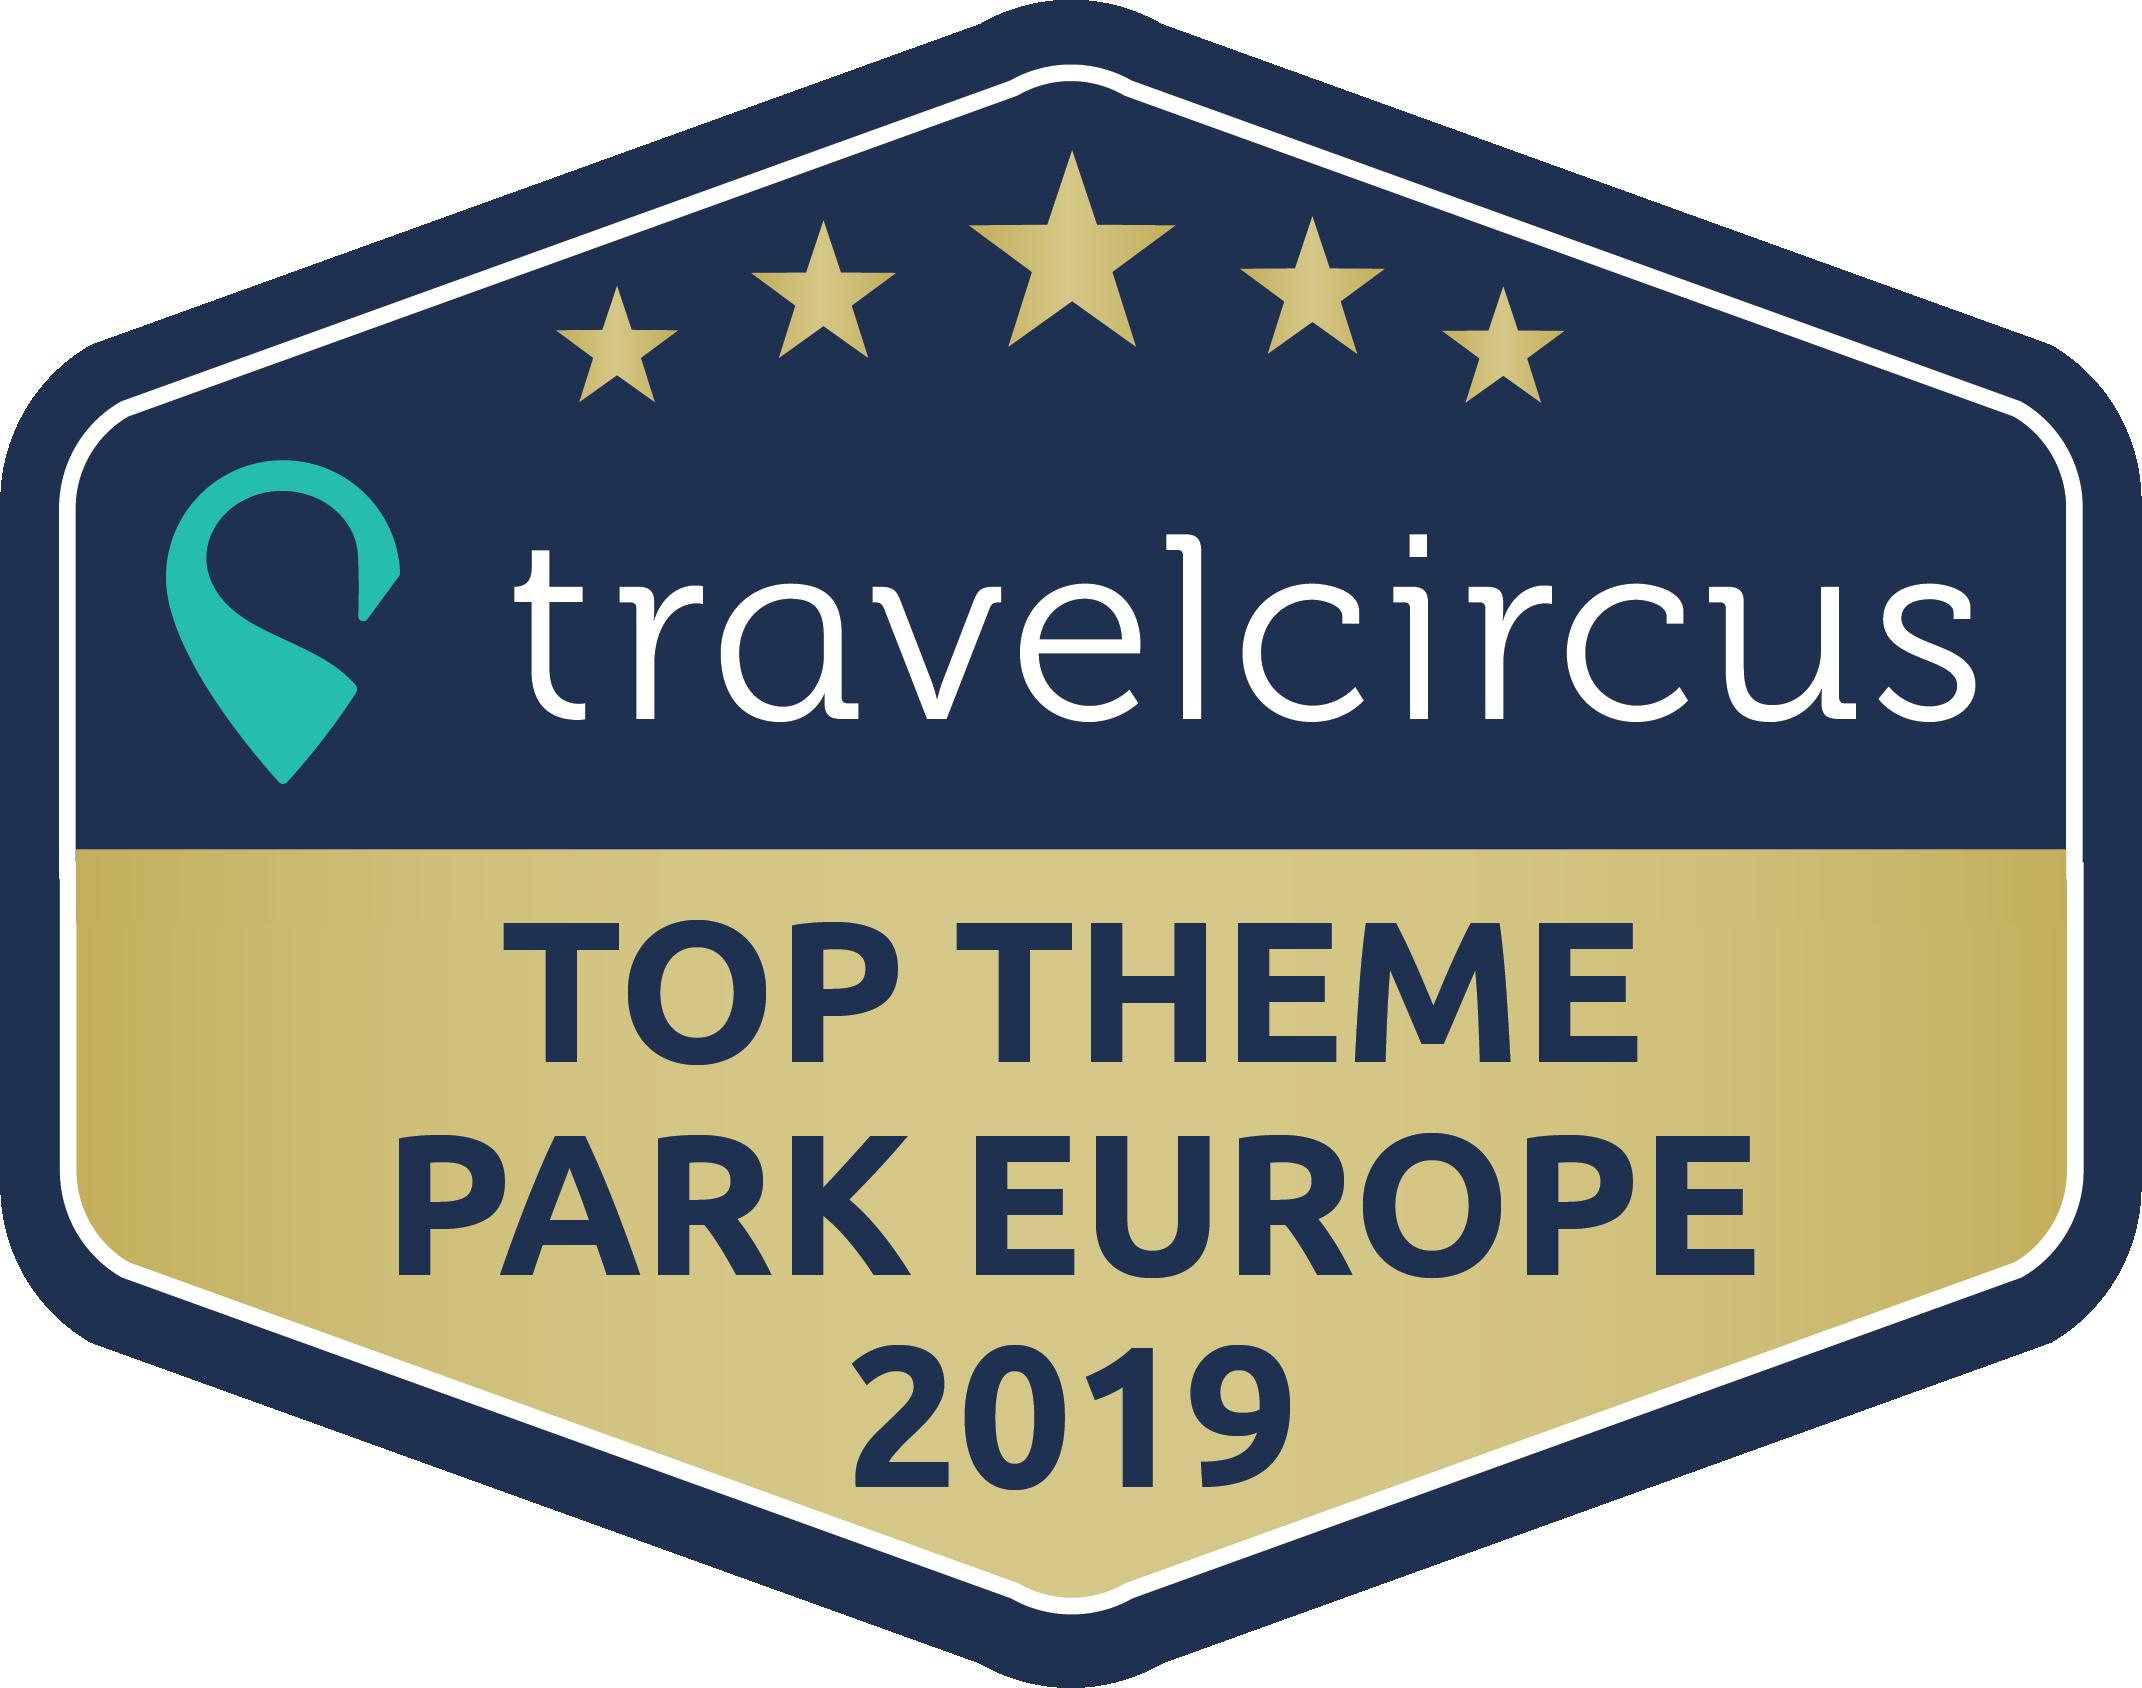 TOP THEME PARK EUROPE 2019